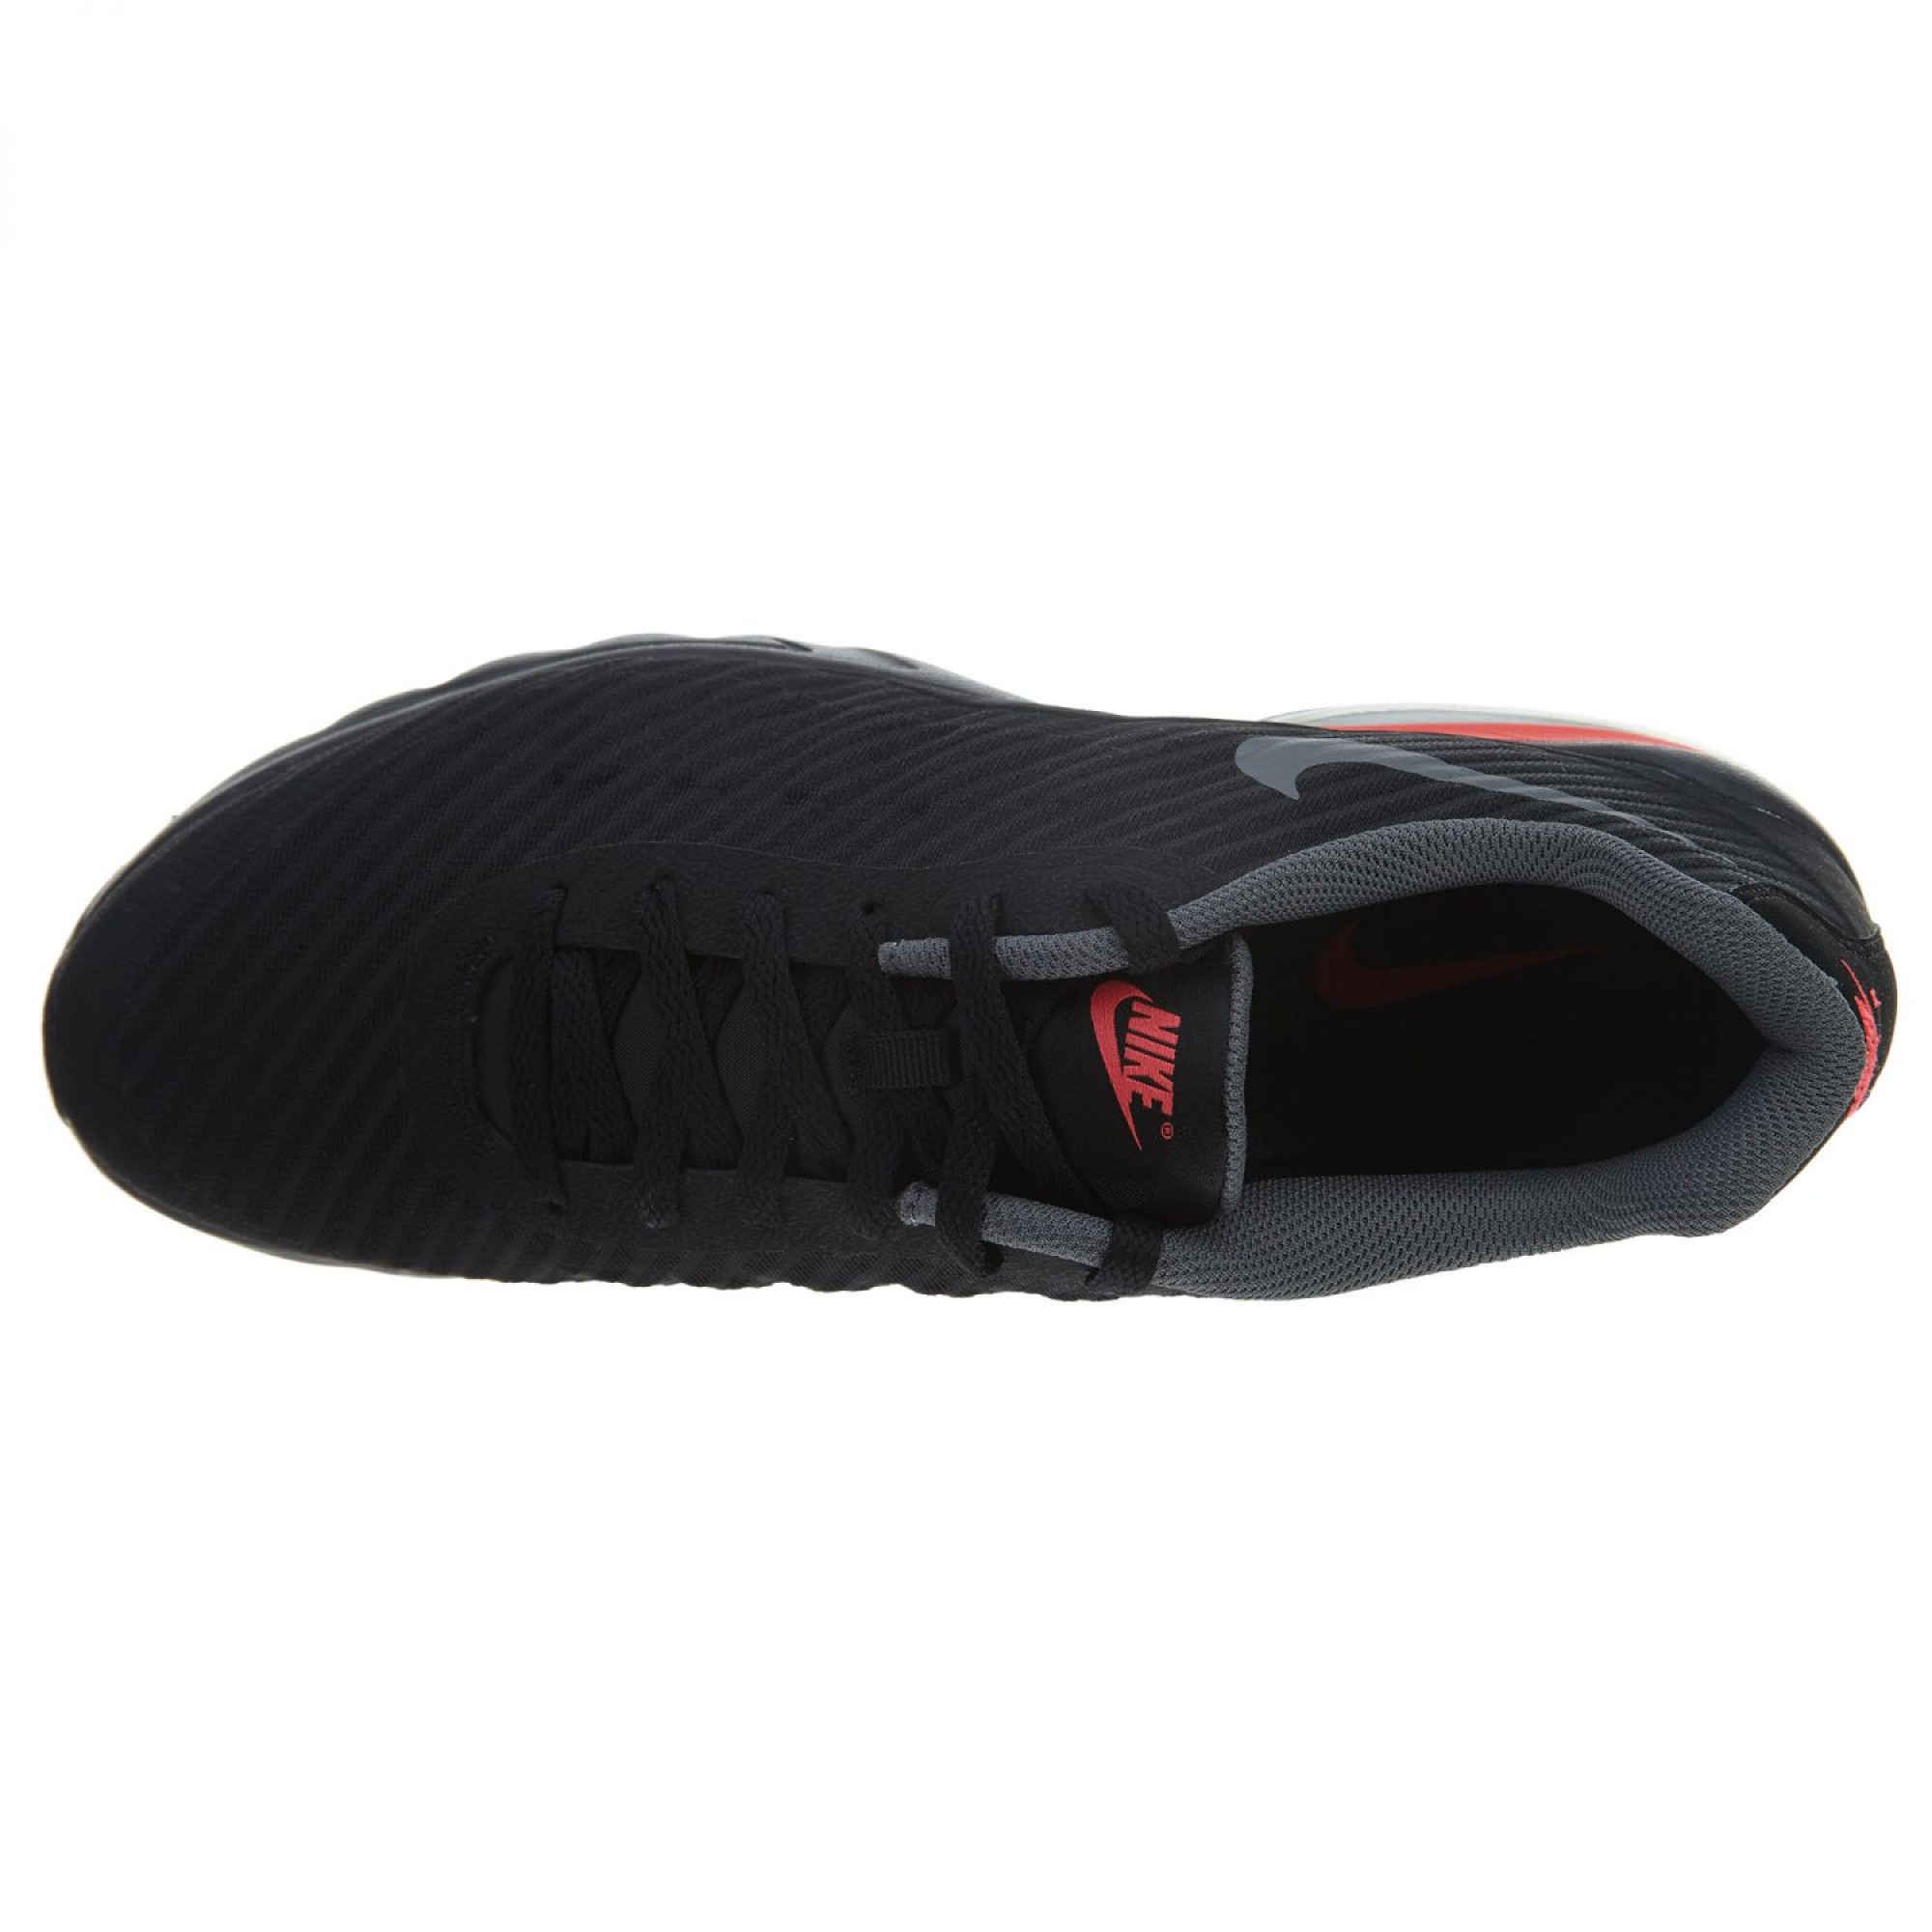 87fb5a054b8 Men's Nike Air Max Invigor Se Black-Grey-Red 870614-004 Ανδρικό Μαύρο -Γκρι-Κόκκινο